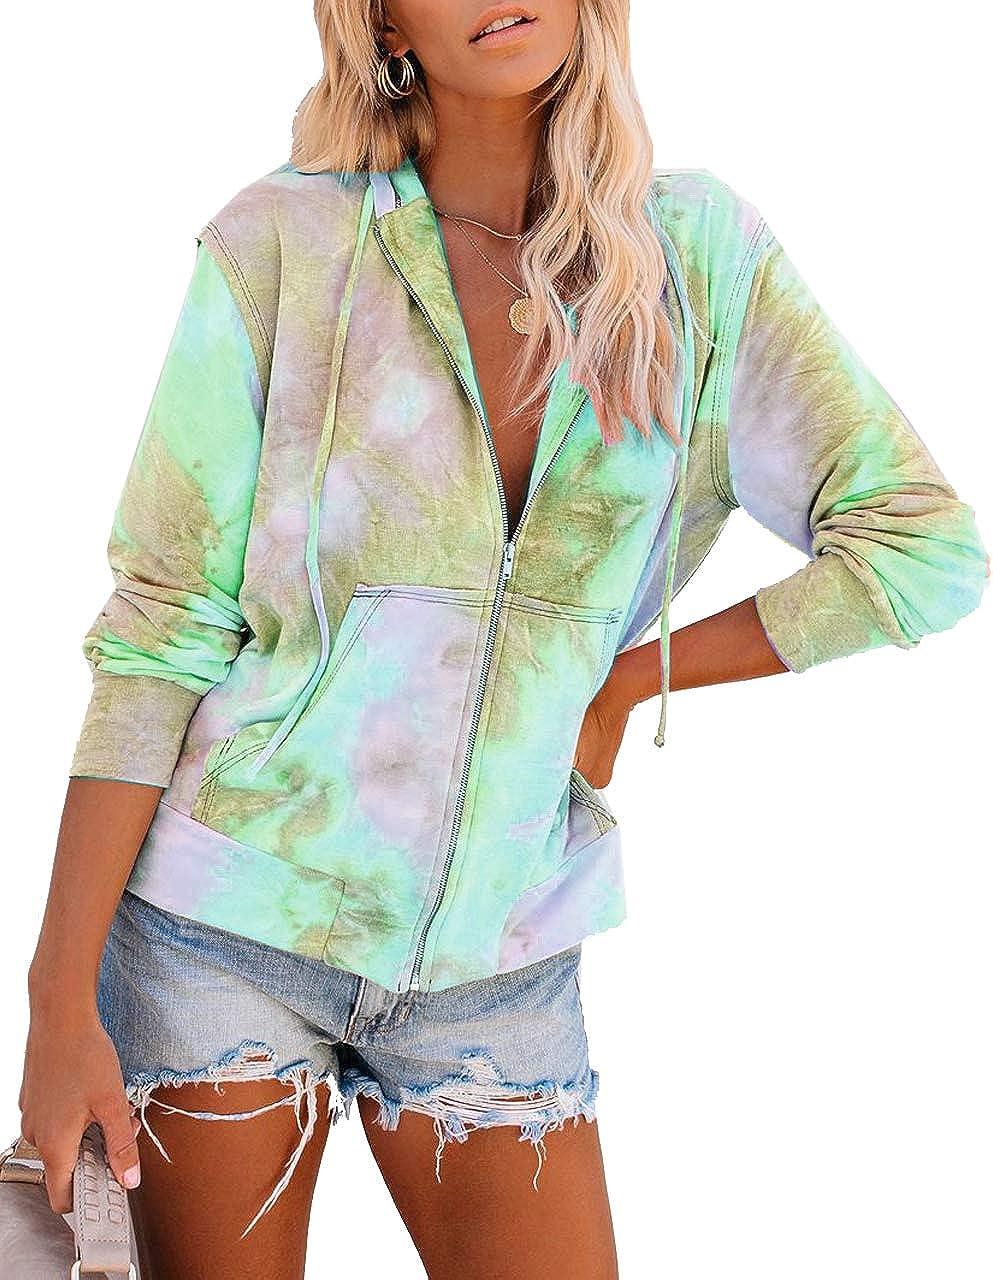 CCBSTS Women Tie Dye Zip-Up Hoodie Jackets Long Sleeve Plus Size Sweatshirt Coats with Pockets